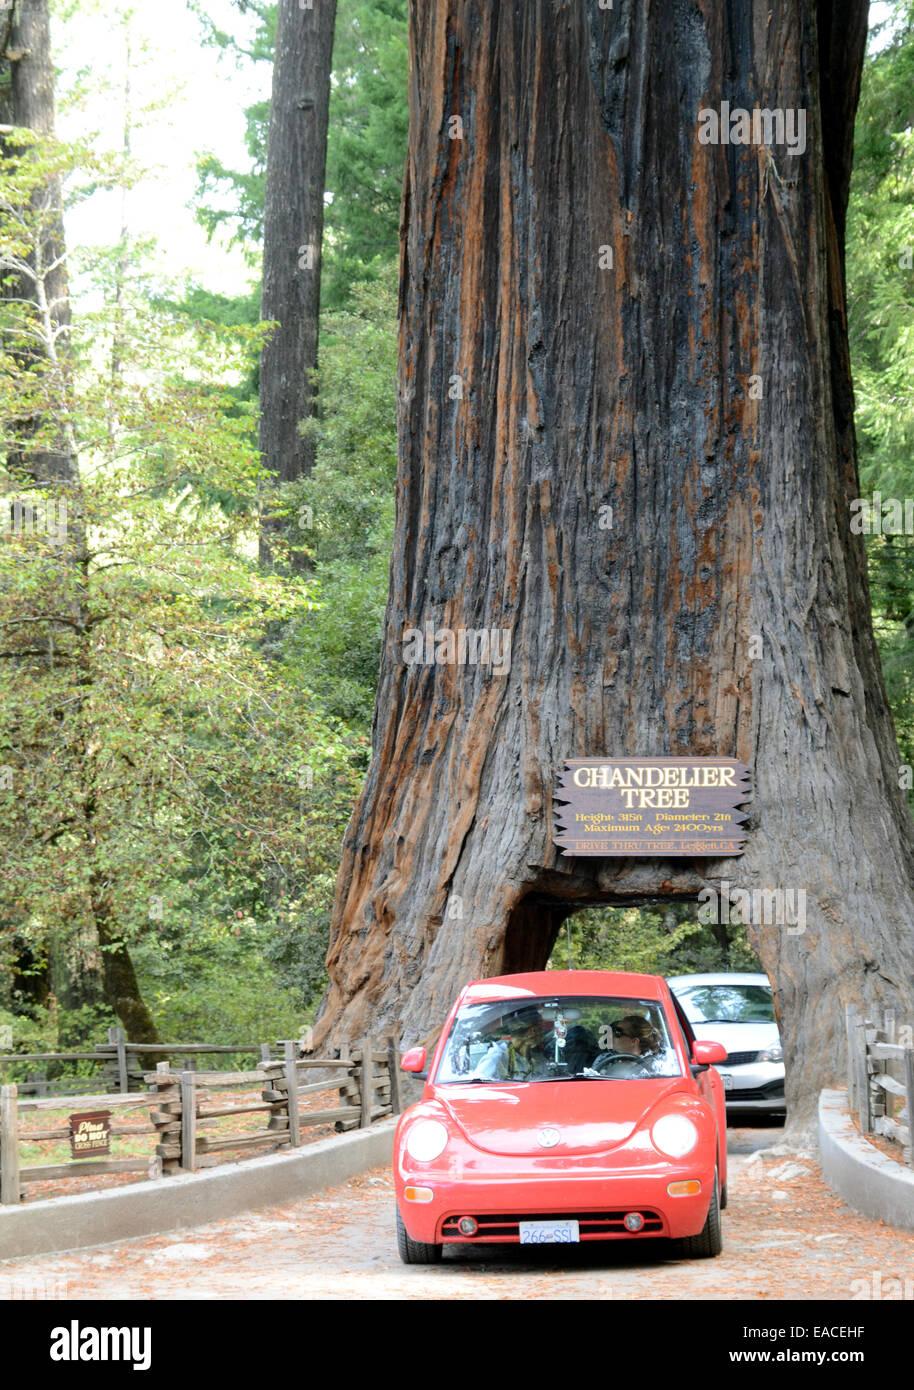 Chandelier tree redwood stock photos chandelier tree redwood stock the chandelier tree california stock image arubaitofo Gallery